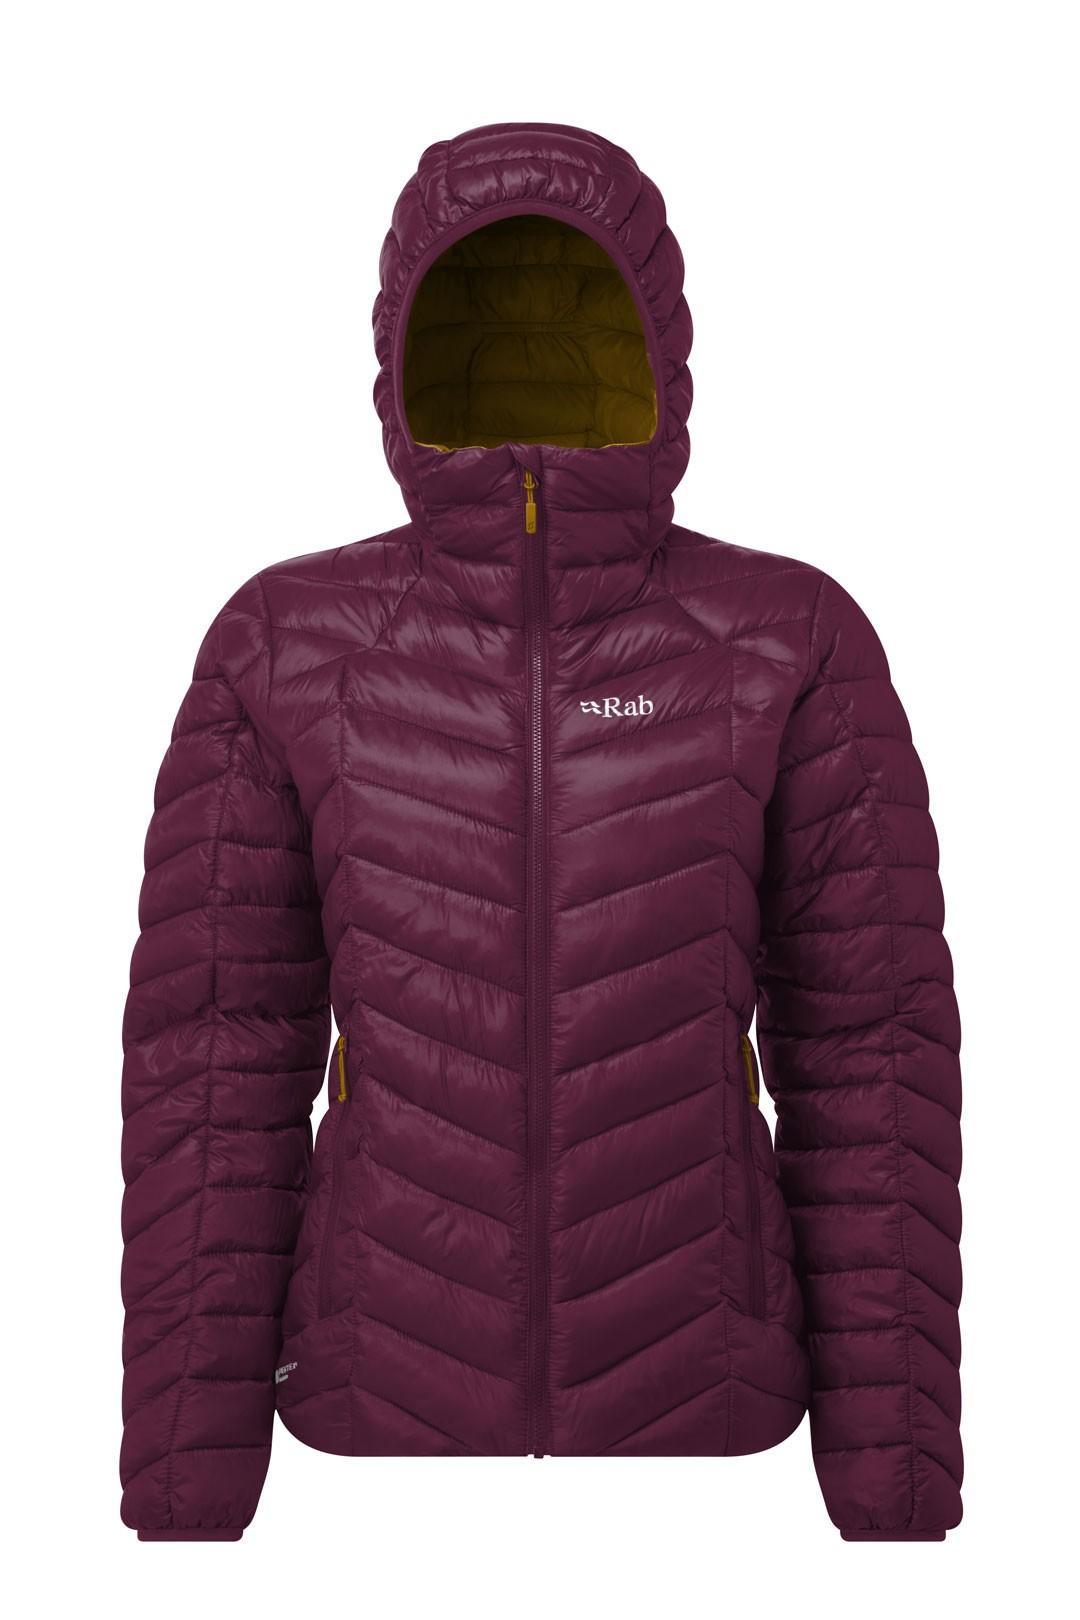 Rab Womens Nimbus Jacket 2018 Eggplant Footprint D 225 Msk 225